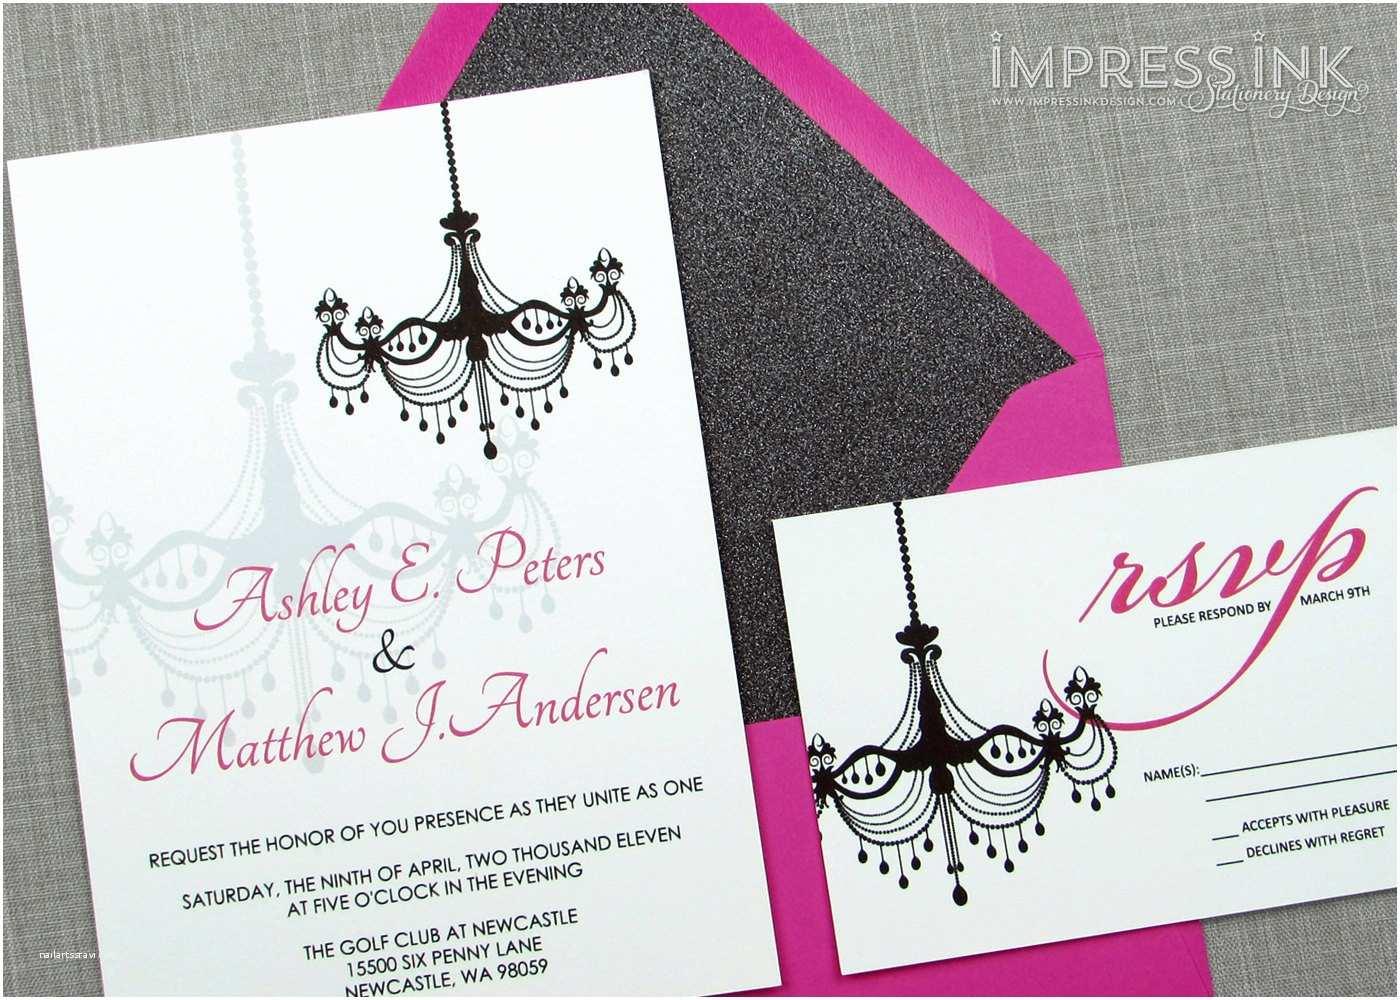 Chandelier Wedding Invitations Modern Victorian Chandelier Wedding Invitation Sample Flat